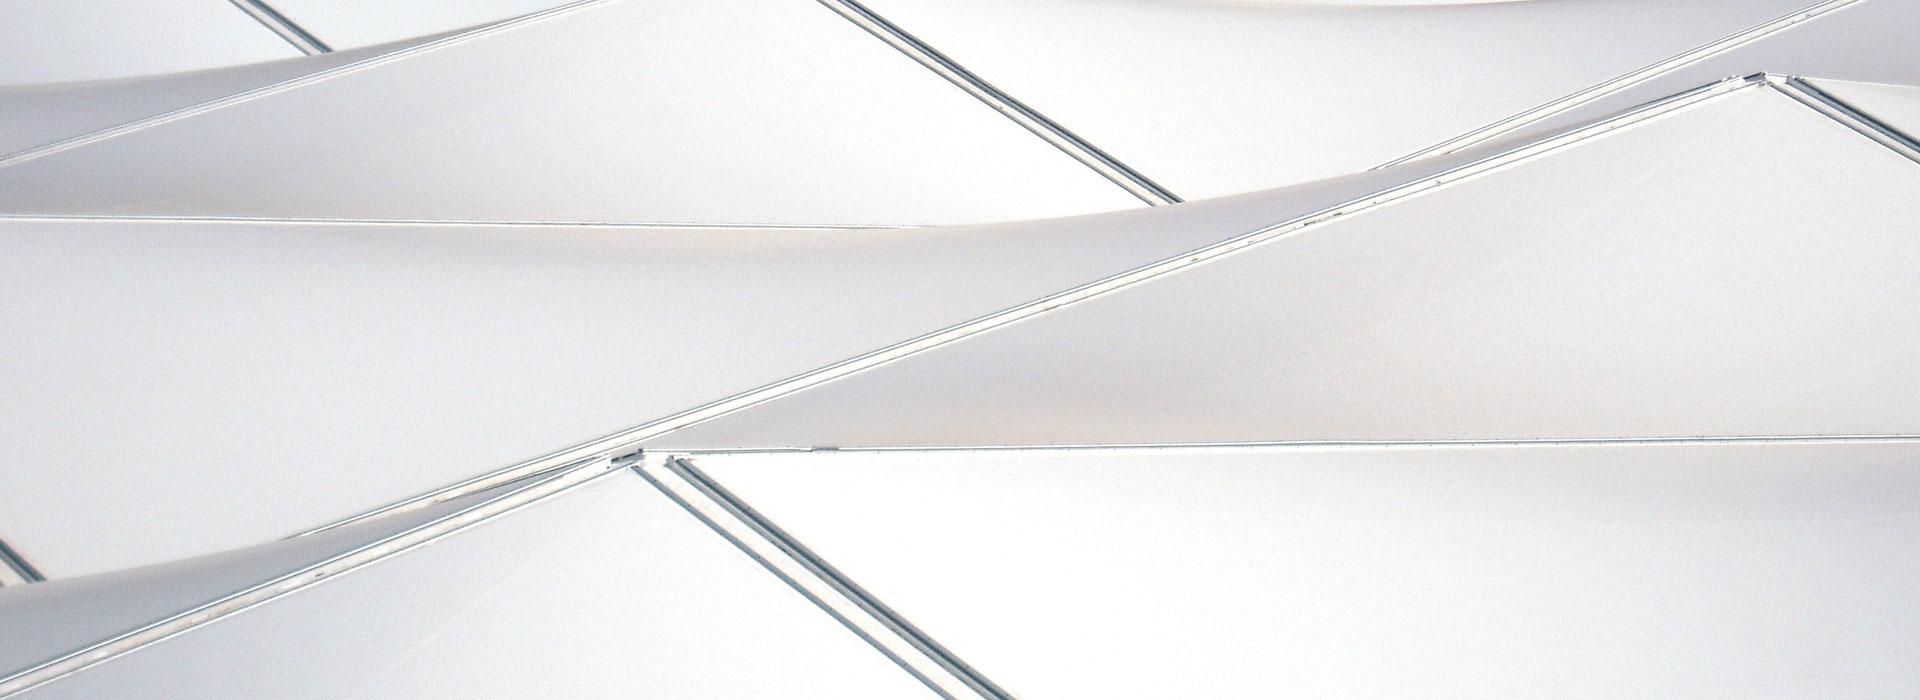 soluciones-espacio-exterior-slide05